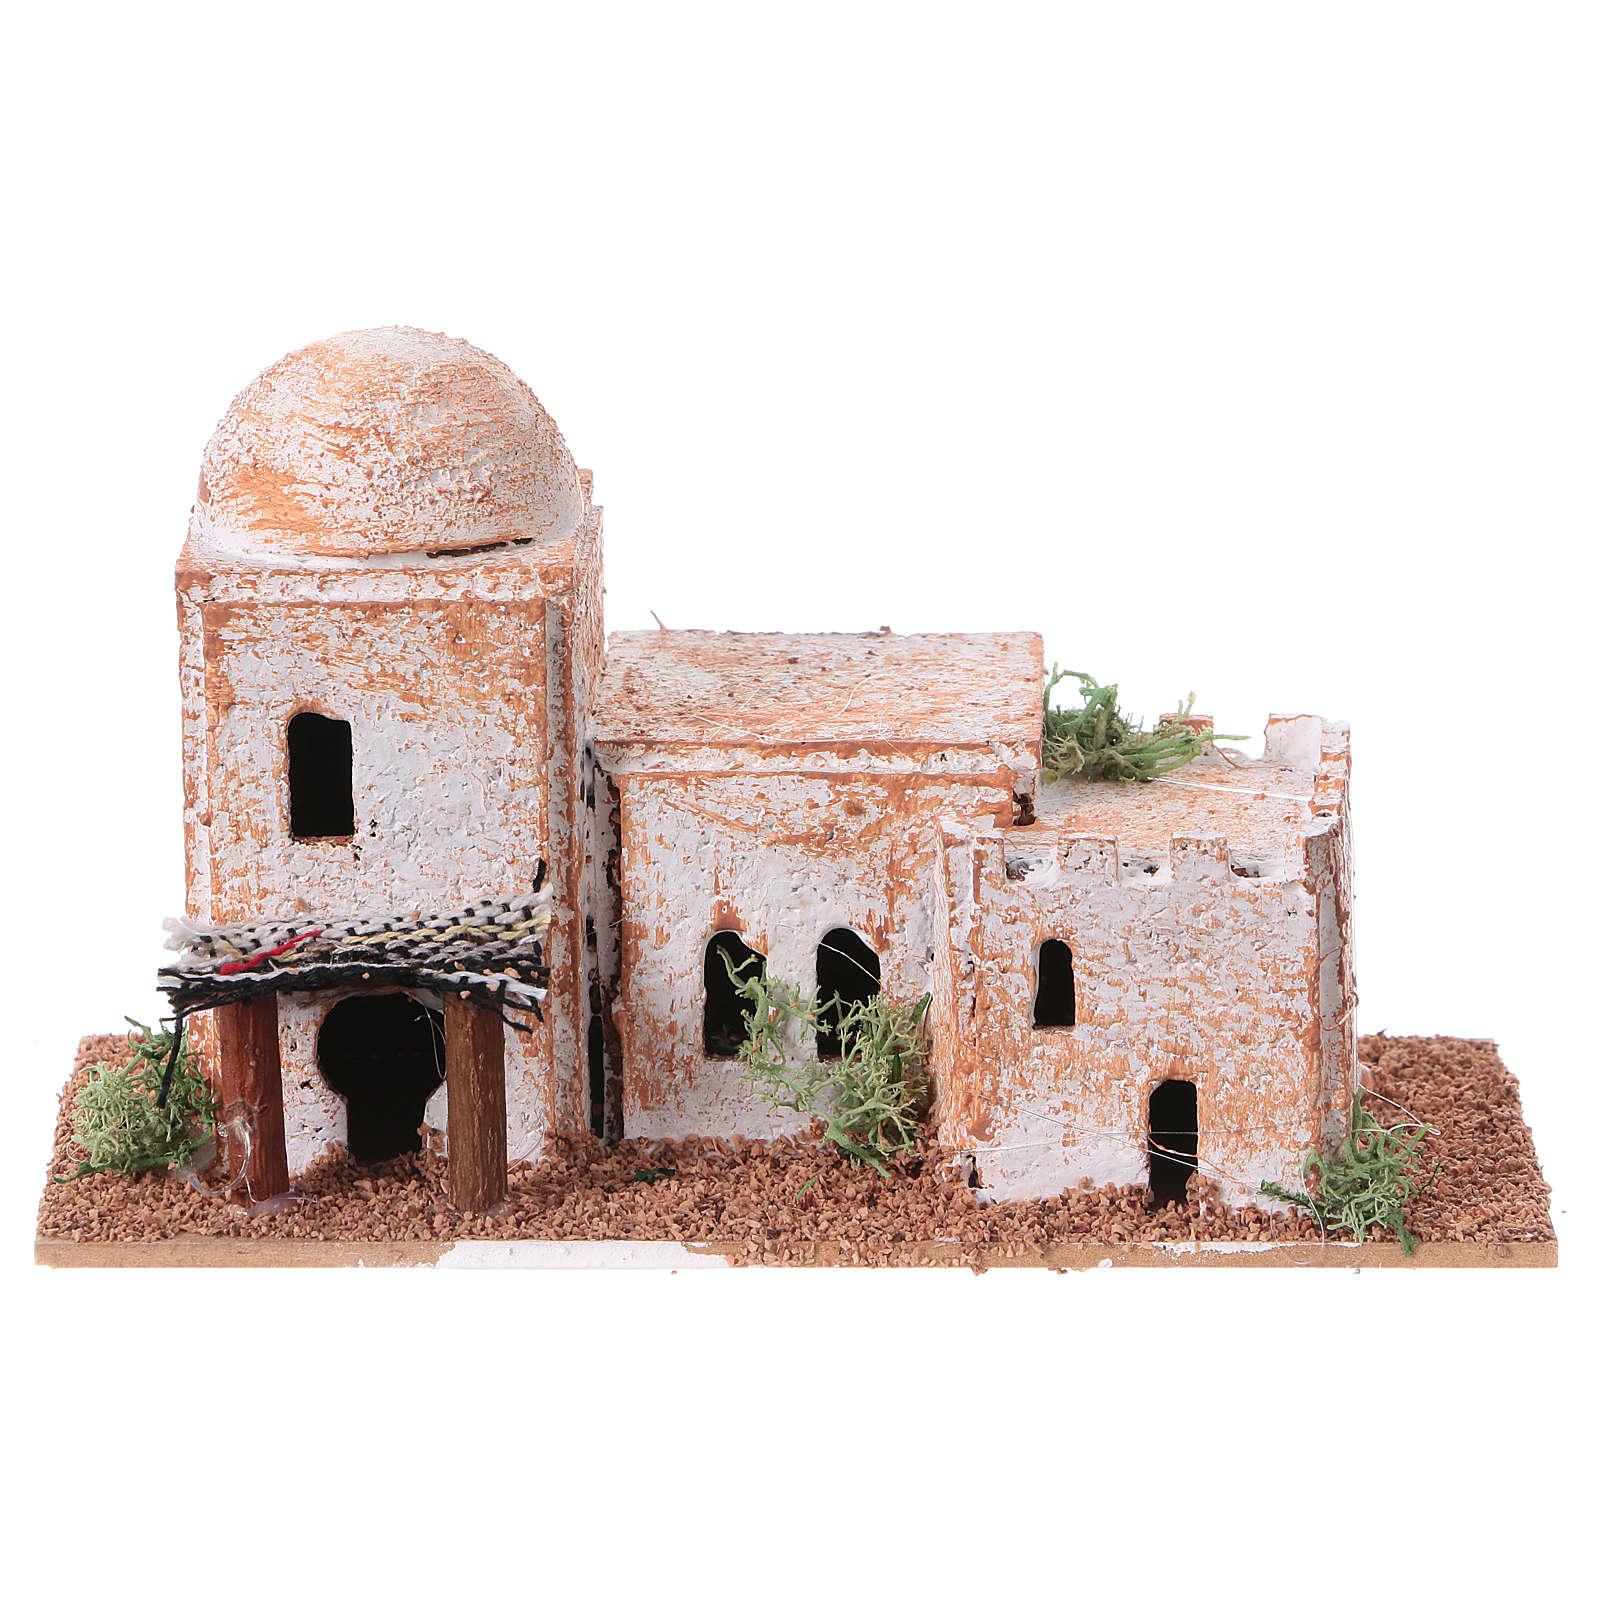 Casa araba sughero 15x7xh.8 cm 4